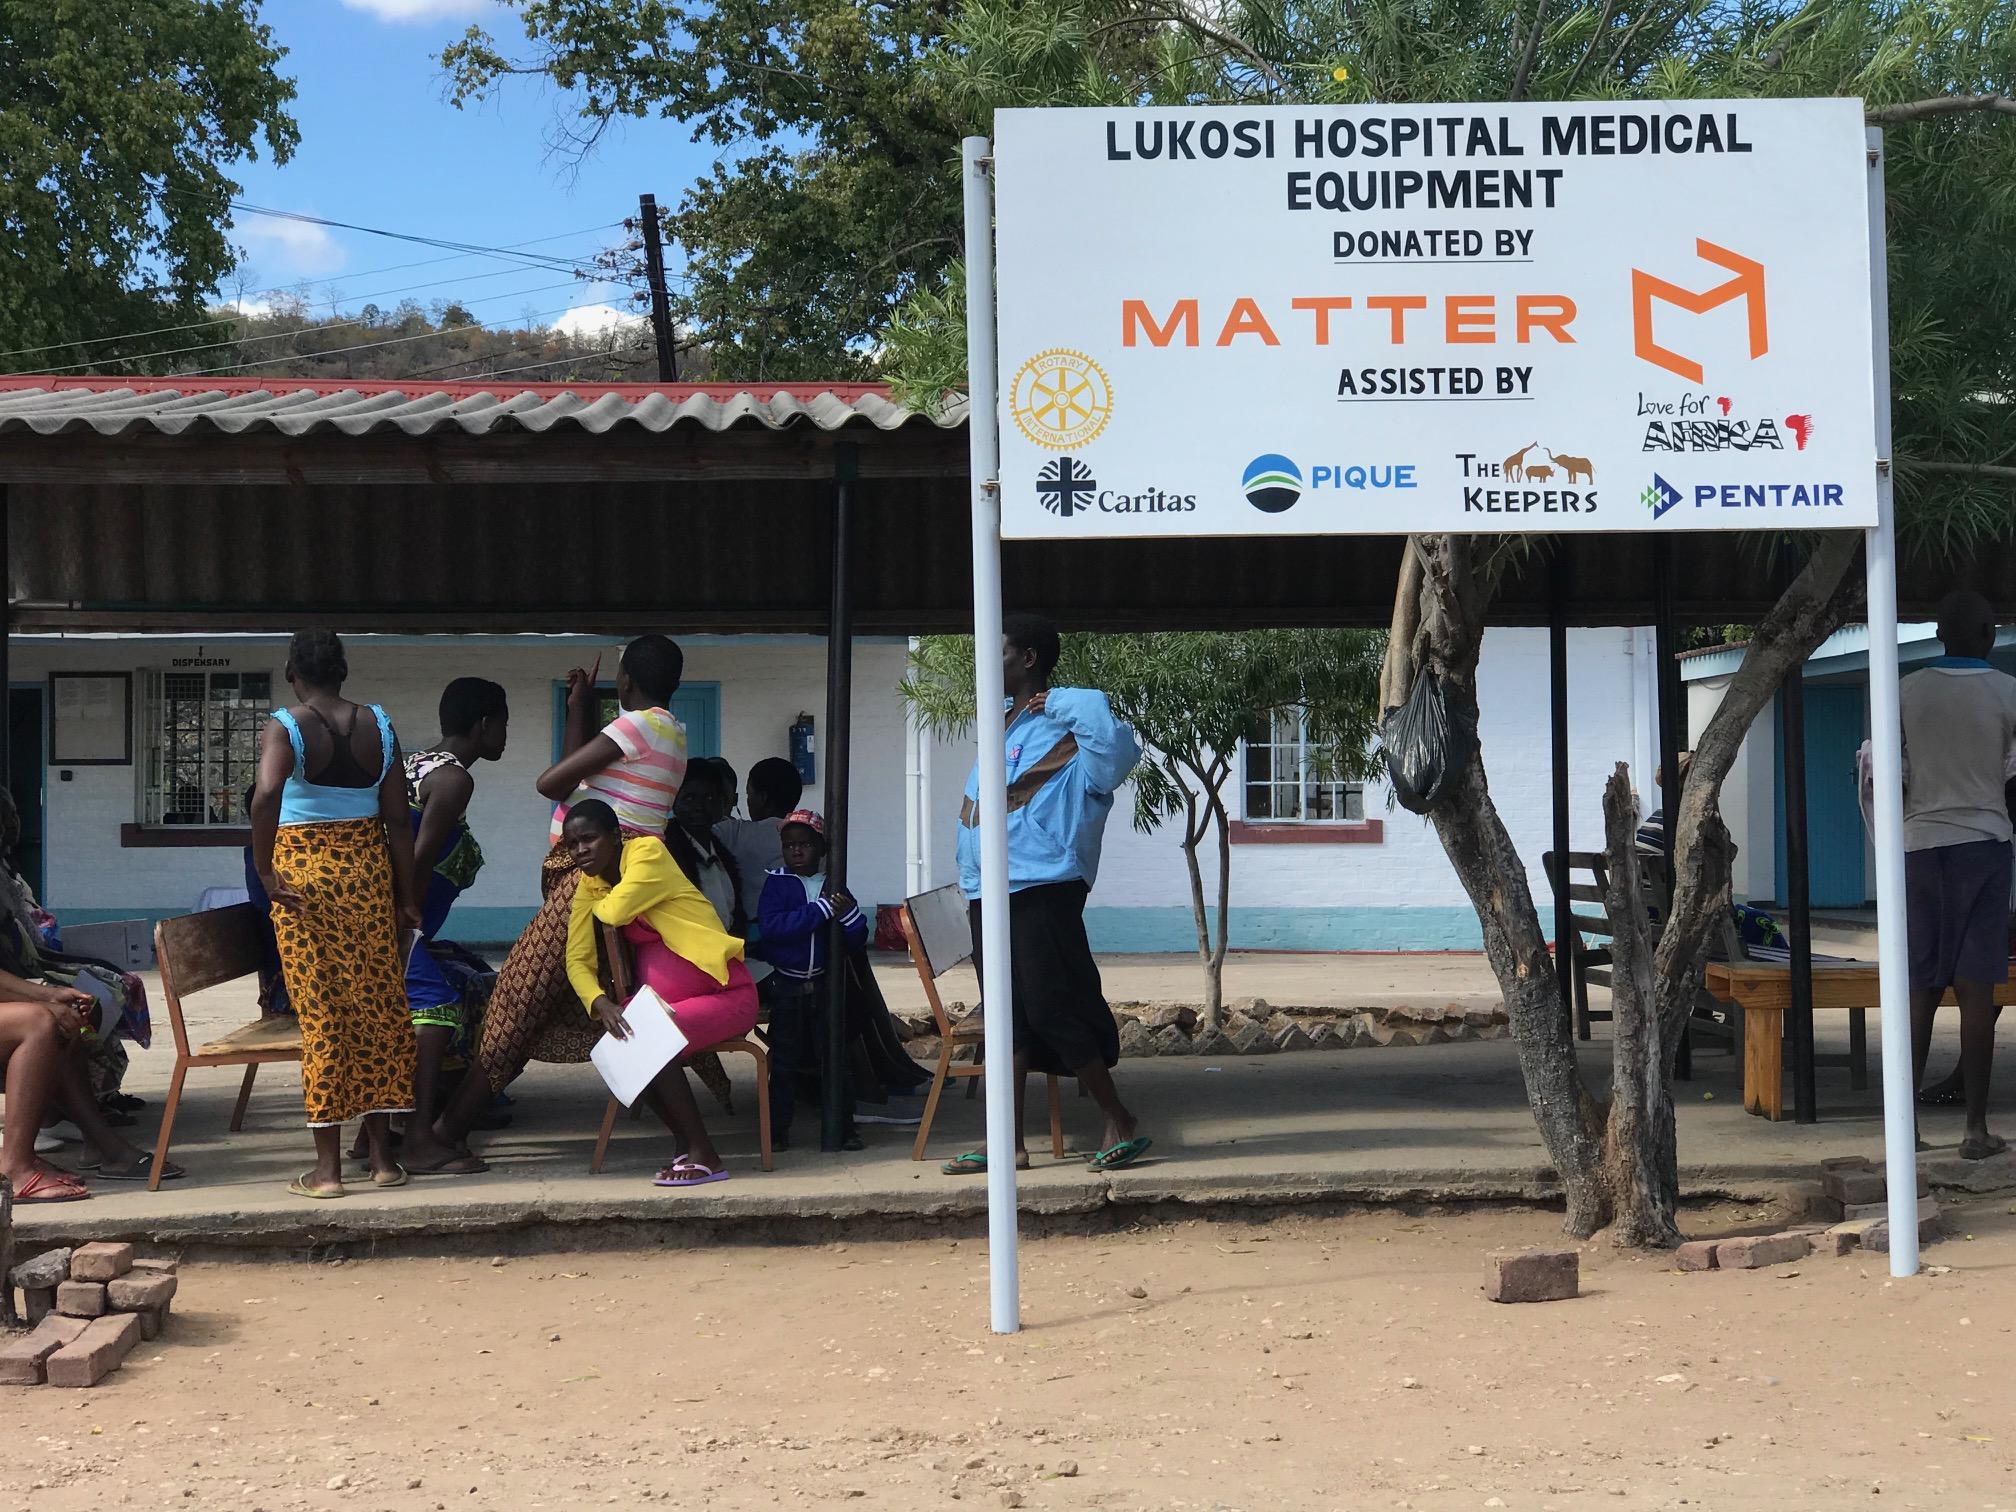 Innovation at Lukosi Hospital in Zimbabwe